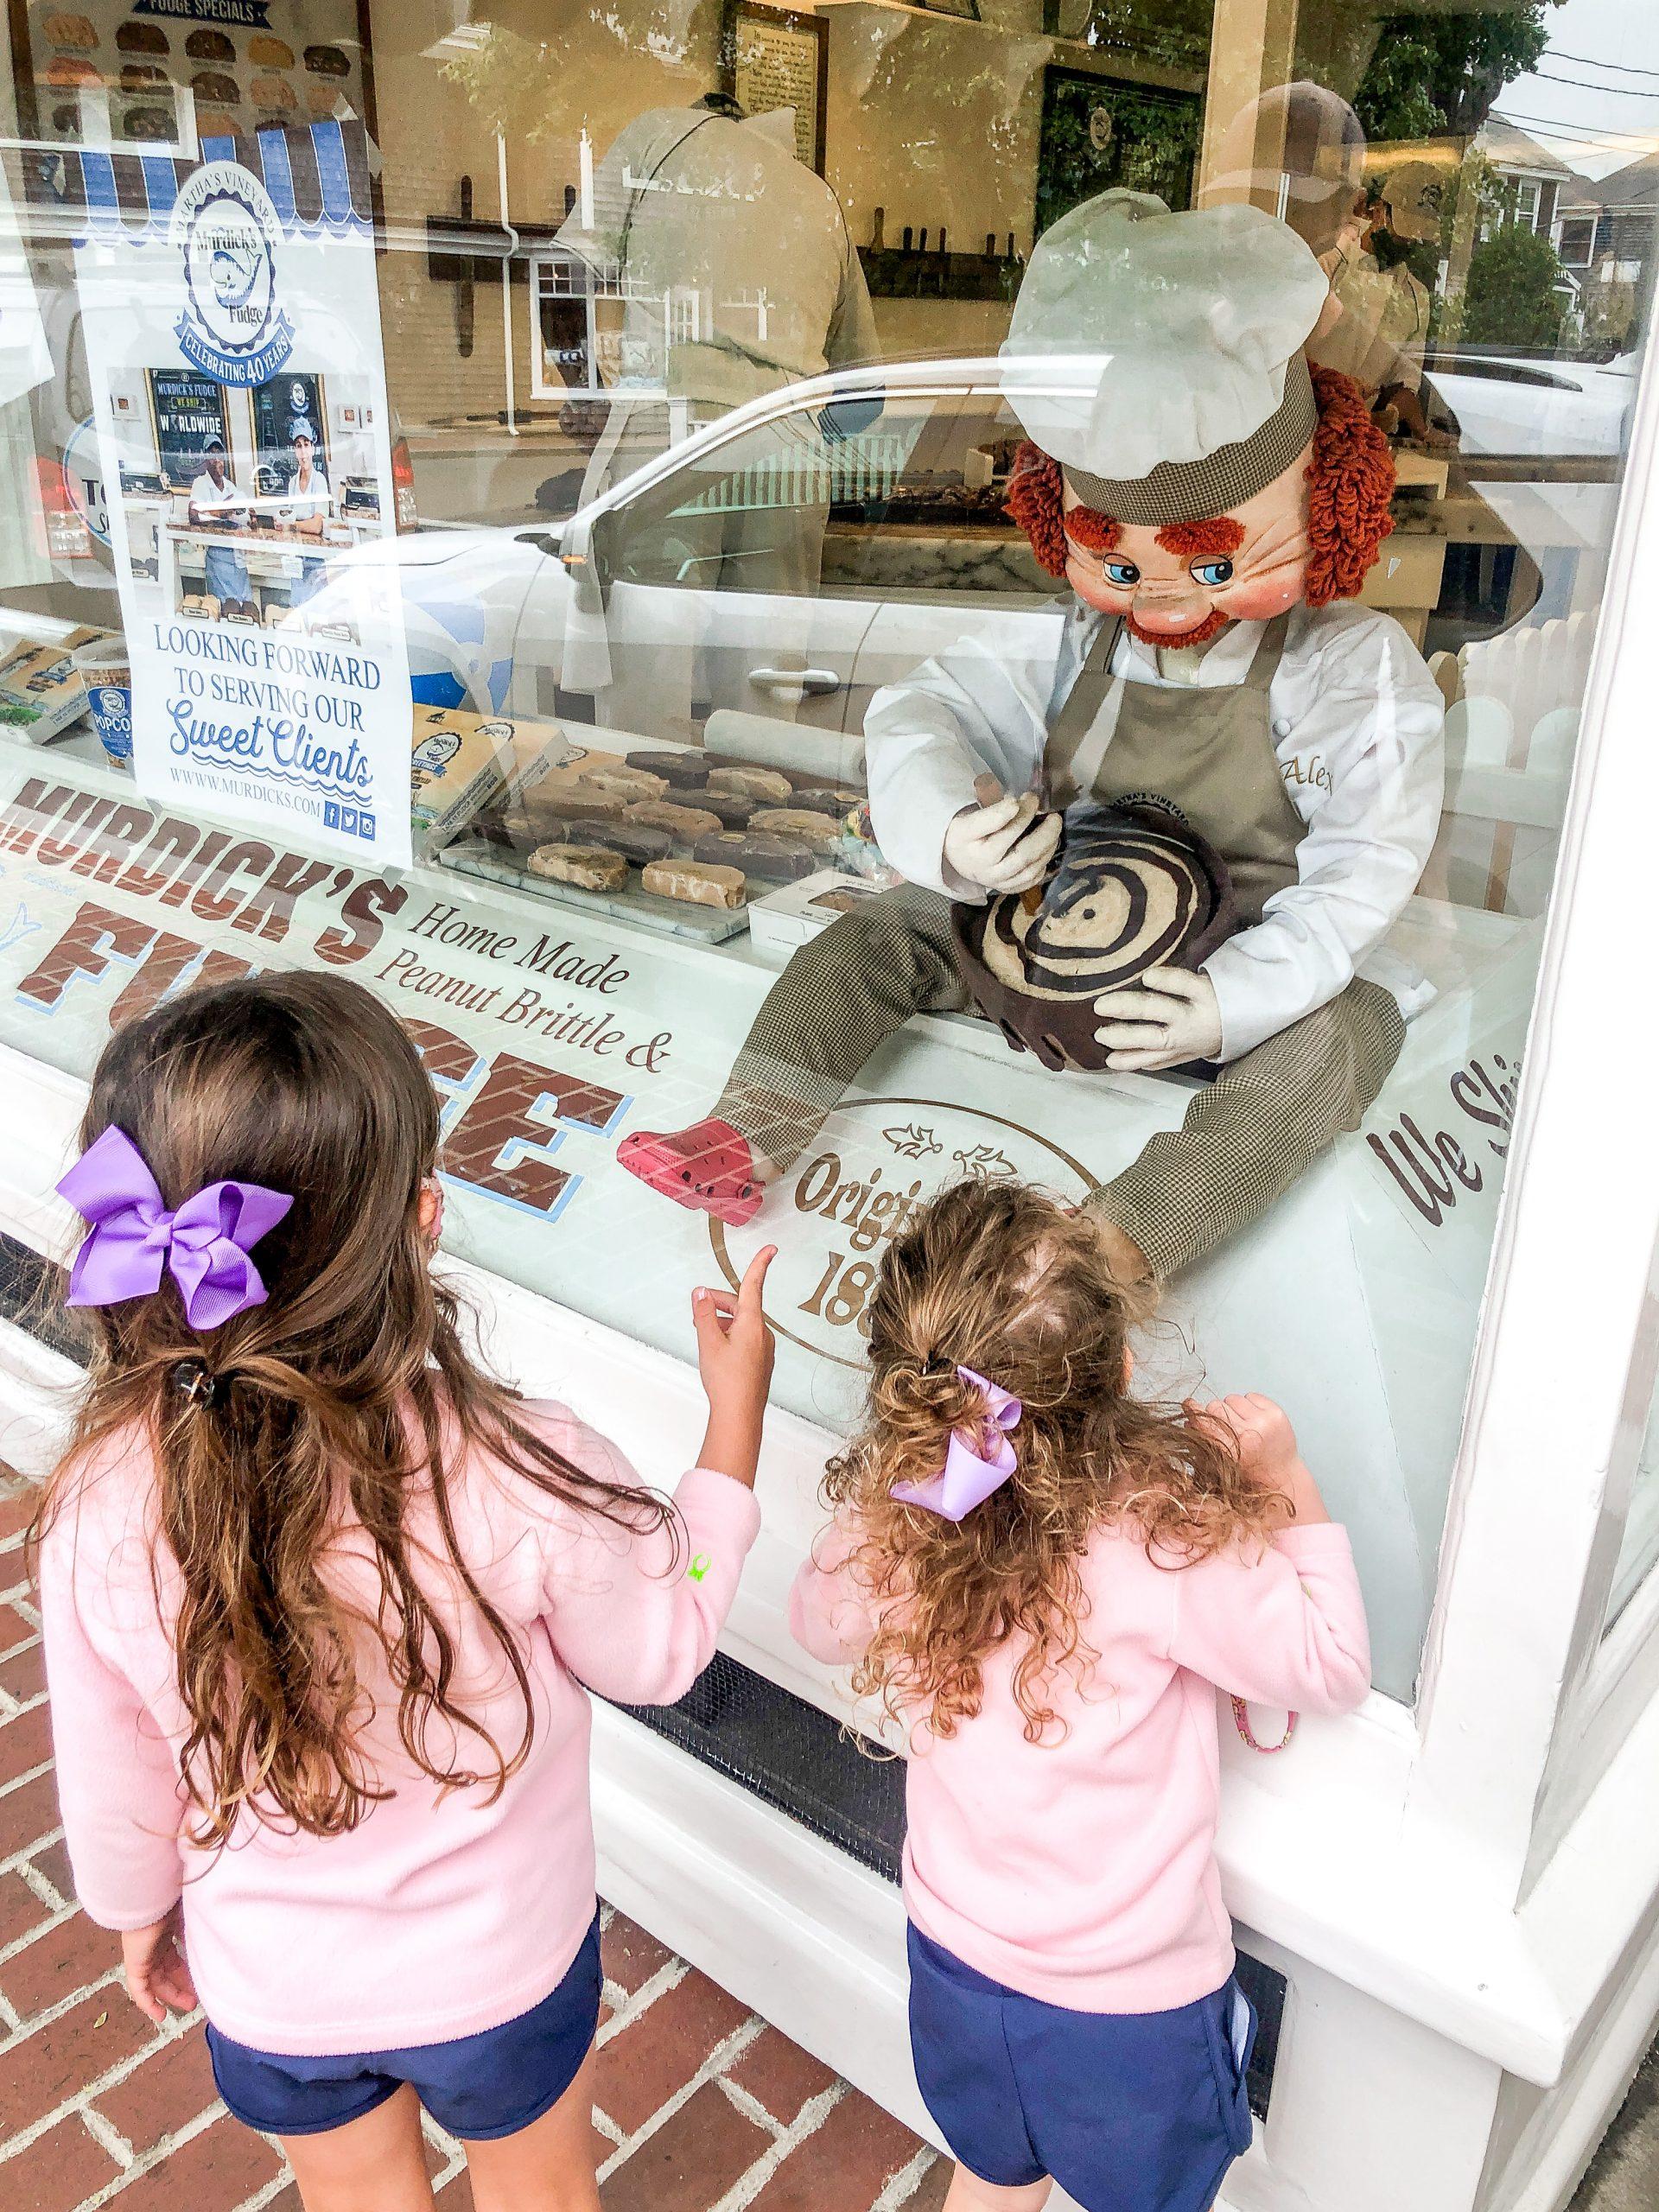 little girls looking in window at Murdick's Fudge Martha's Vineyard